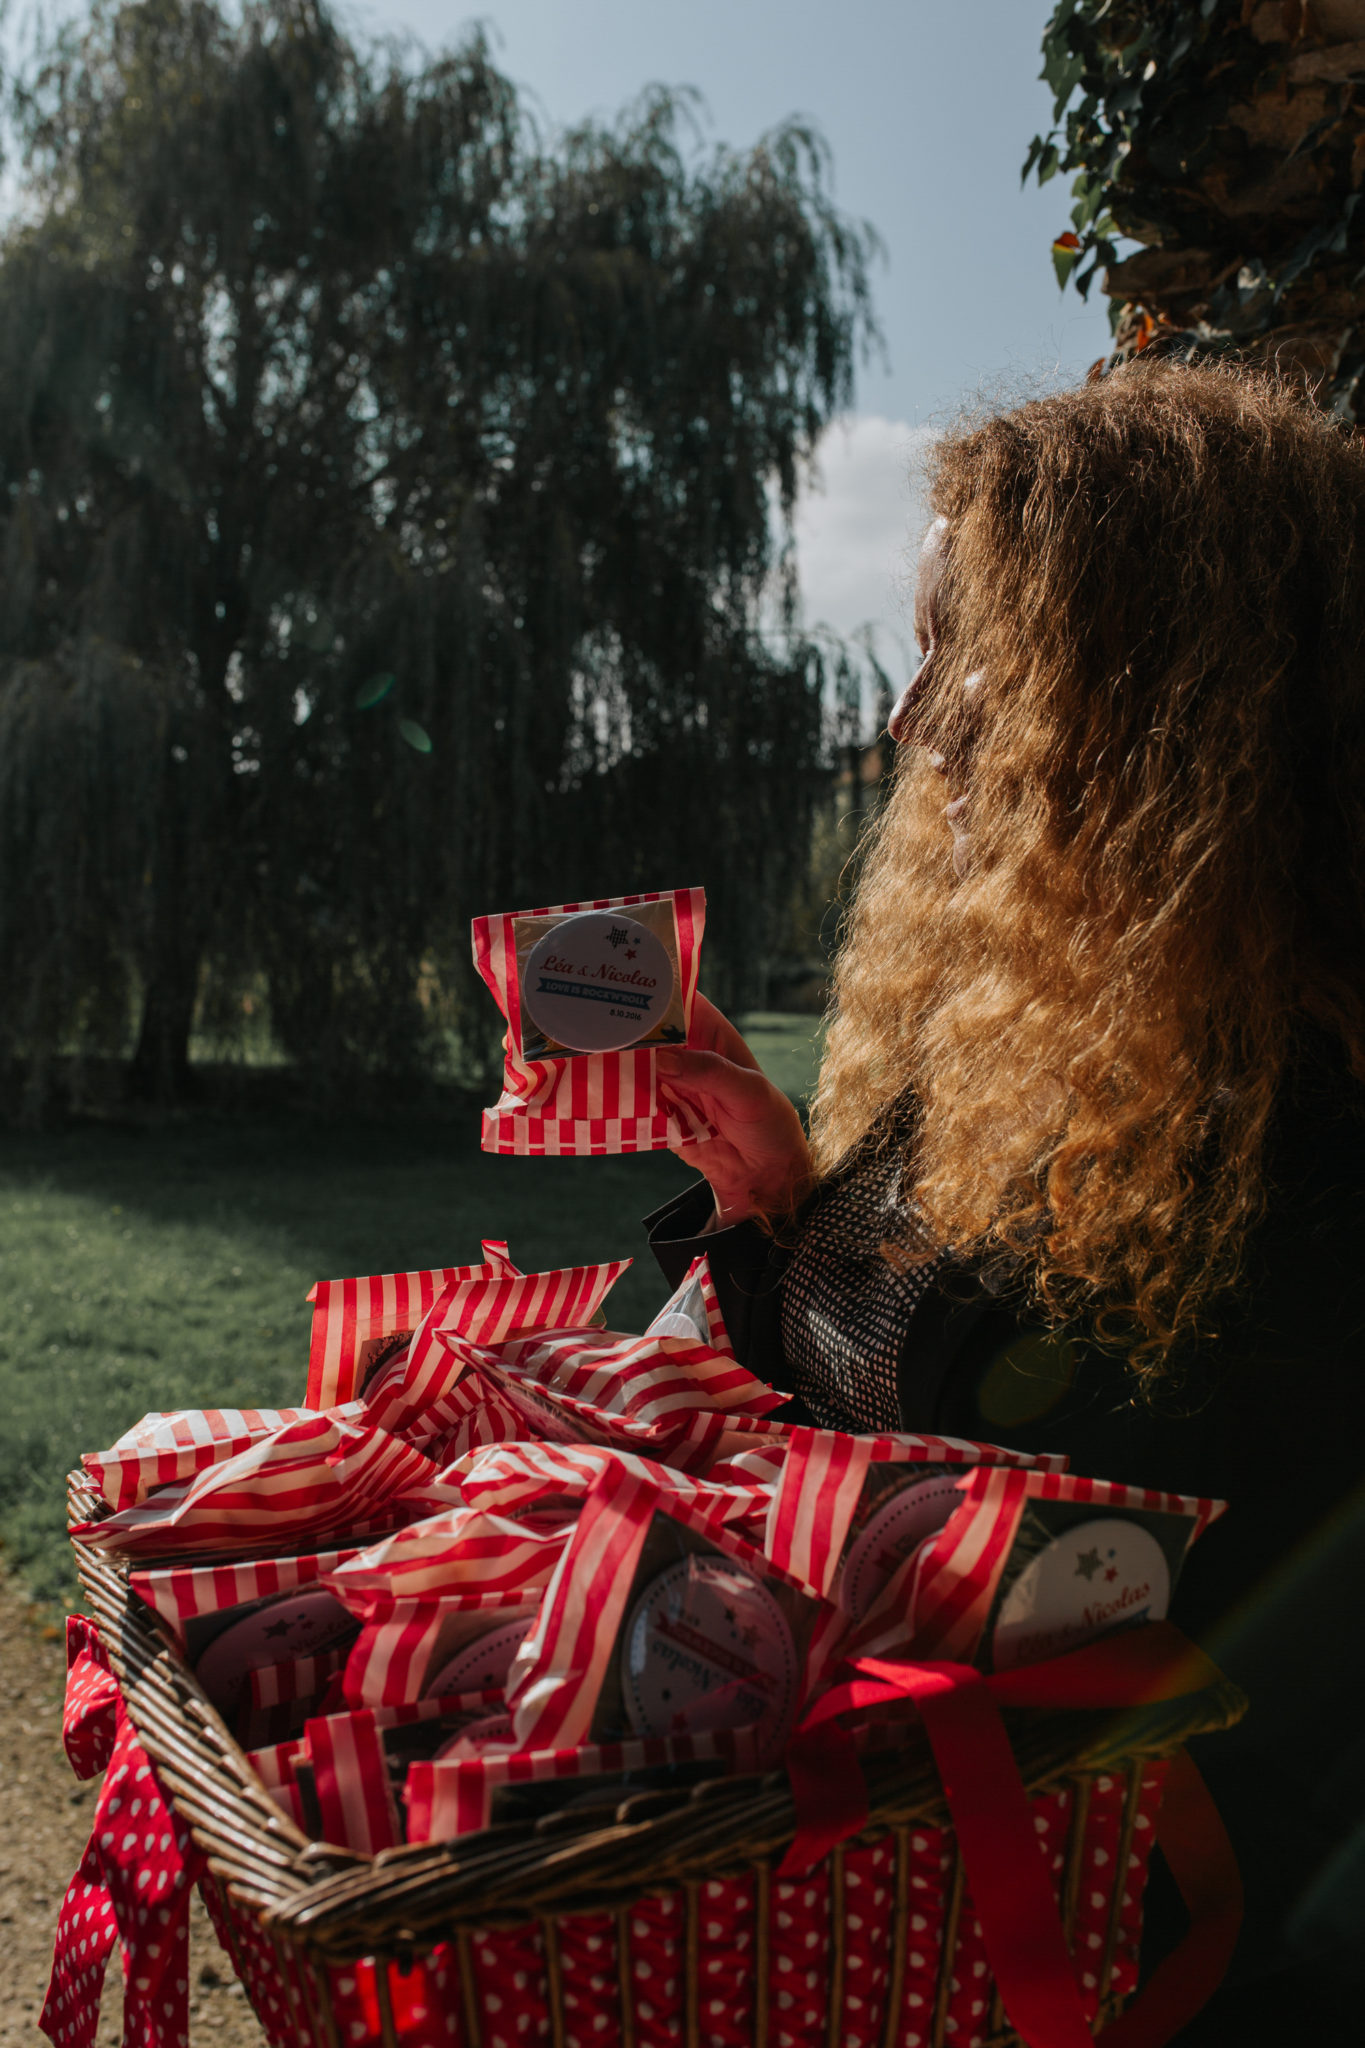 Pochette cadeau invité rayures rouge blanc panier ouvreuse Mariage 50s Domaine Mauvoisin Lommoye